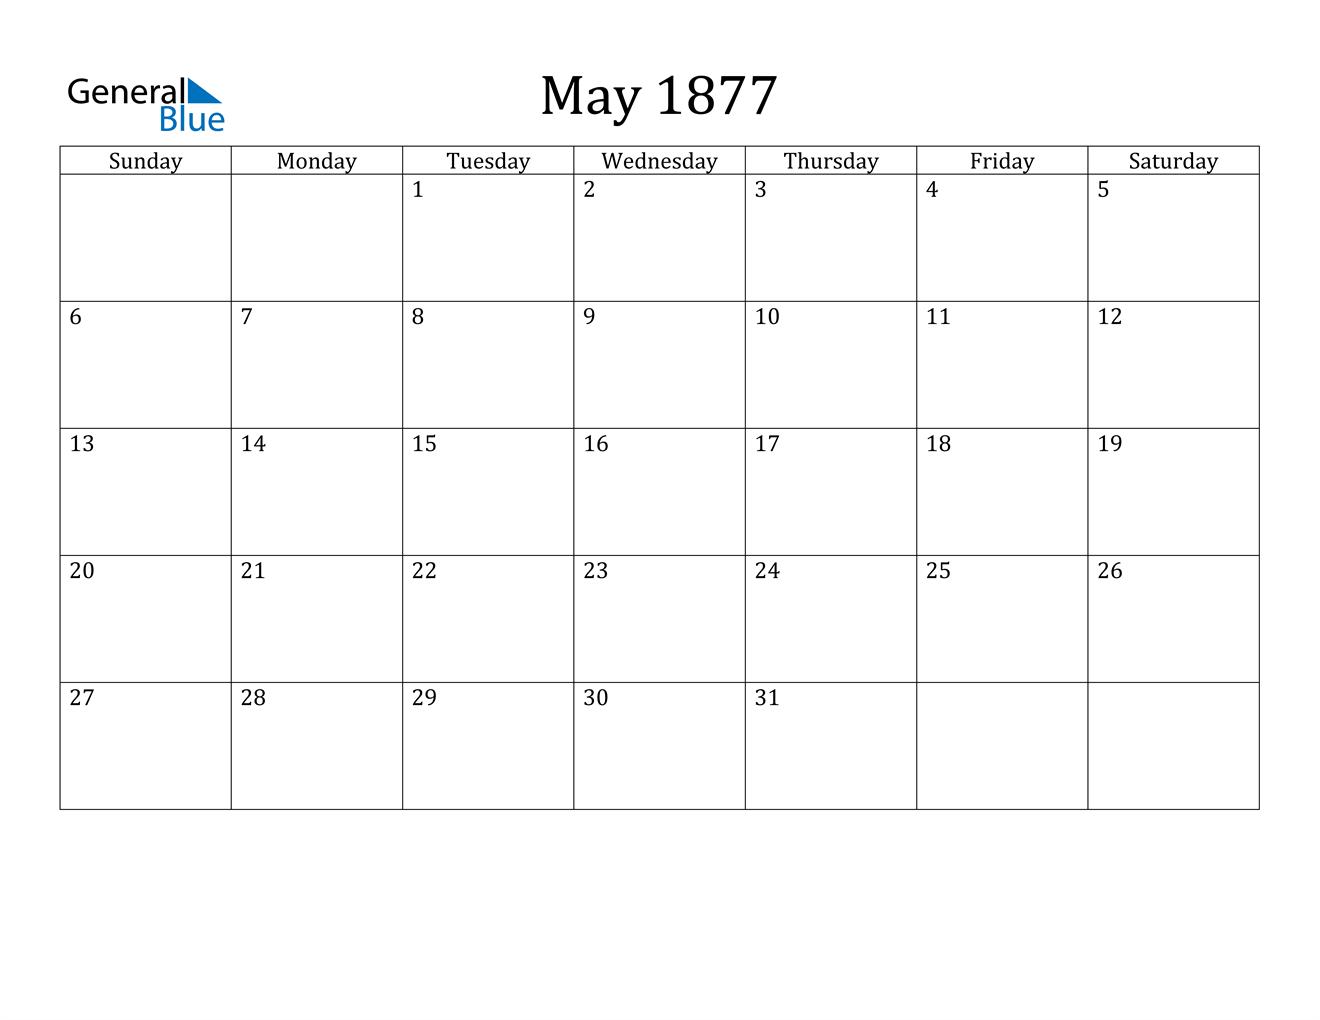 Image of May 1877 Calendar